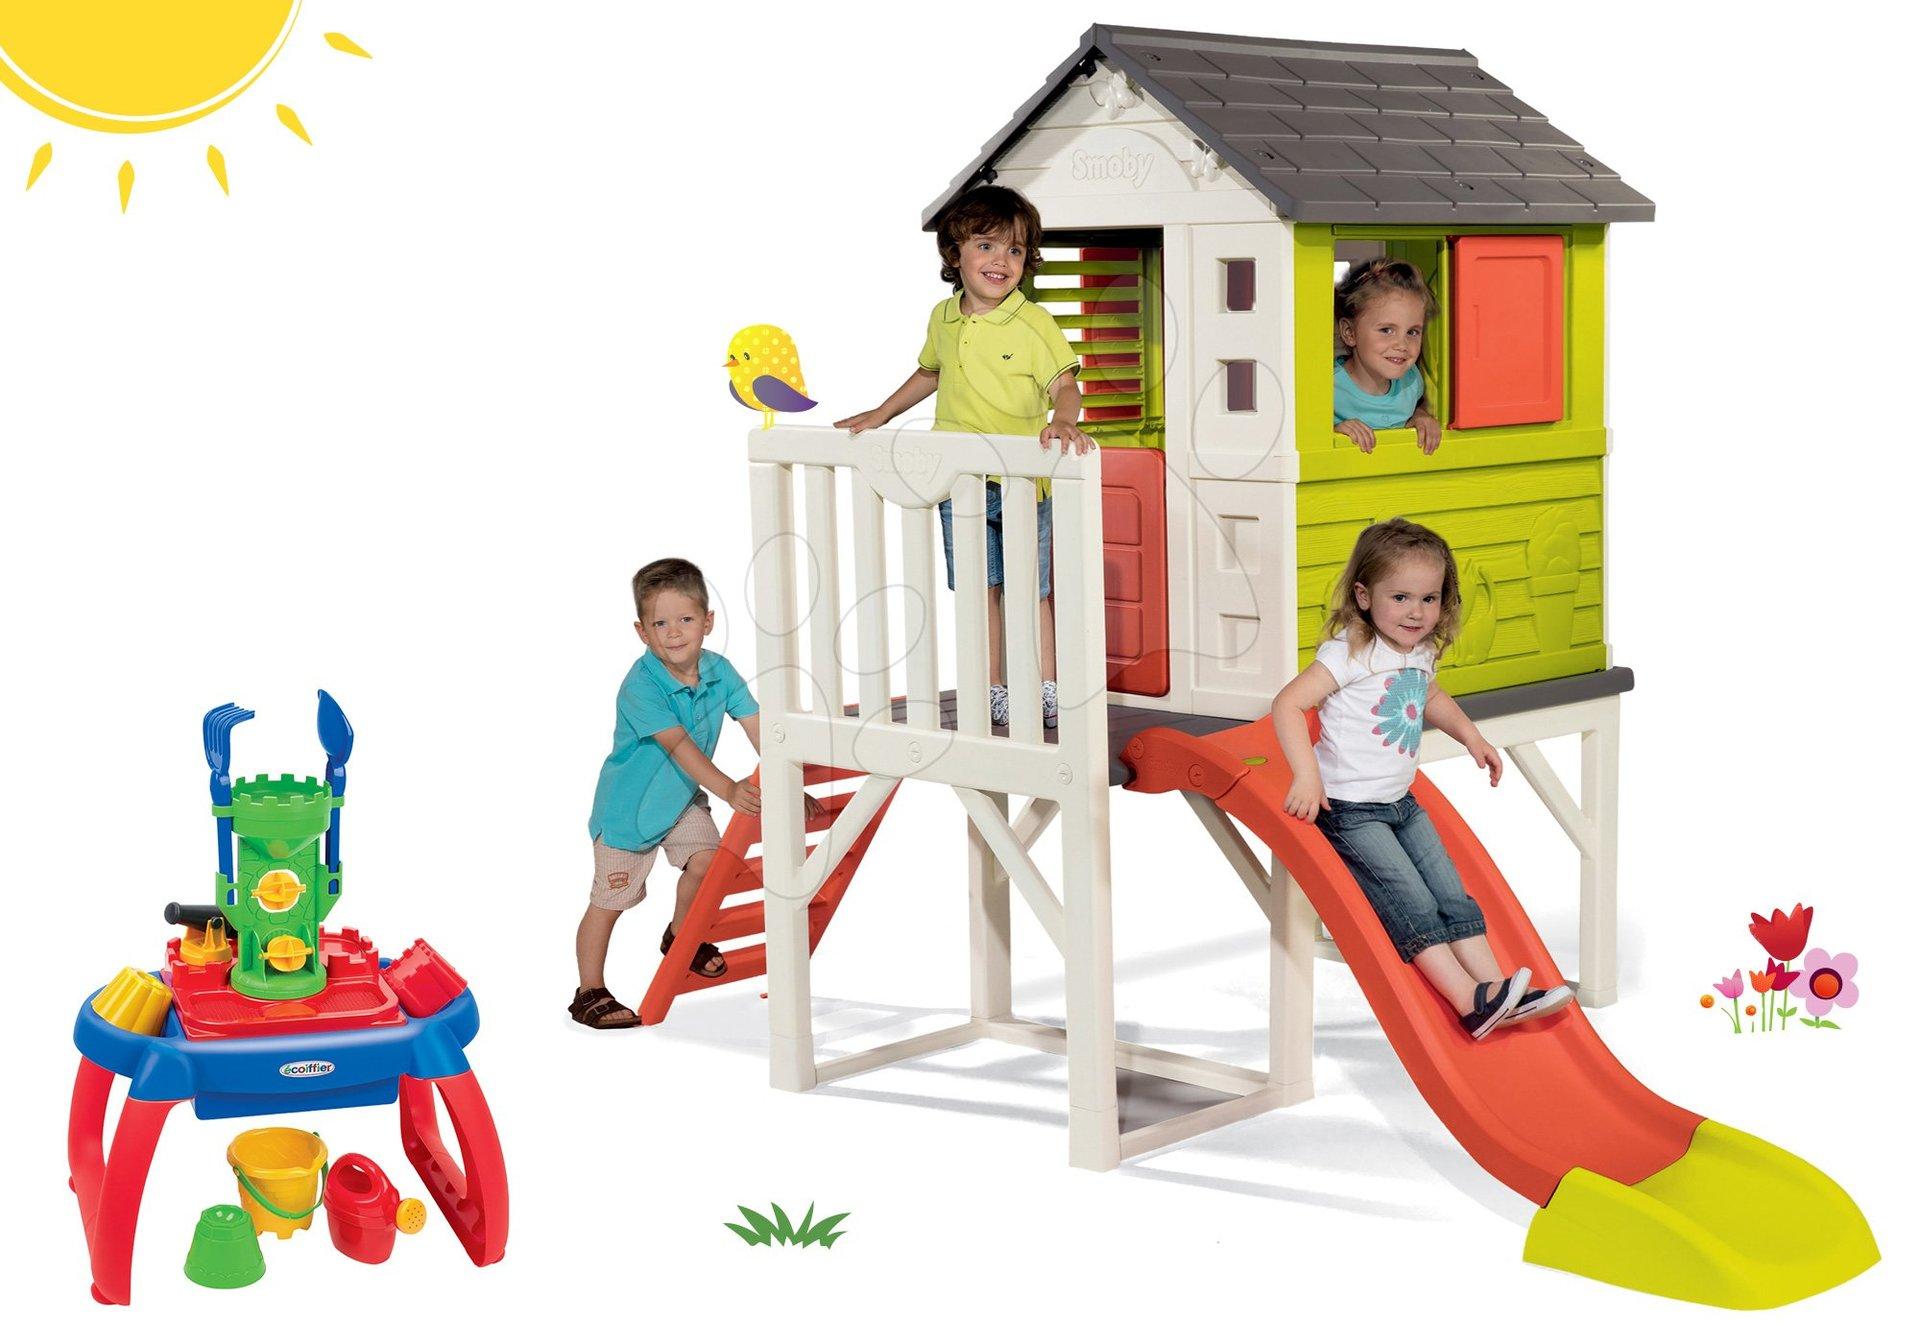 Smoby set detský domček na pilieroch Pilings House s 1,5 m šmykľavkou a pieskovisko stolík na vodu a piesok 810800-30